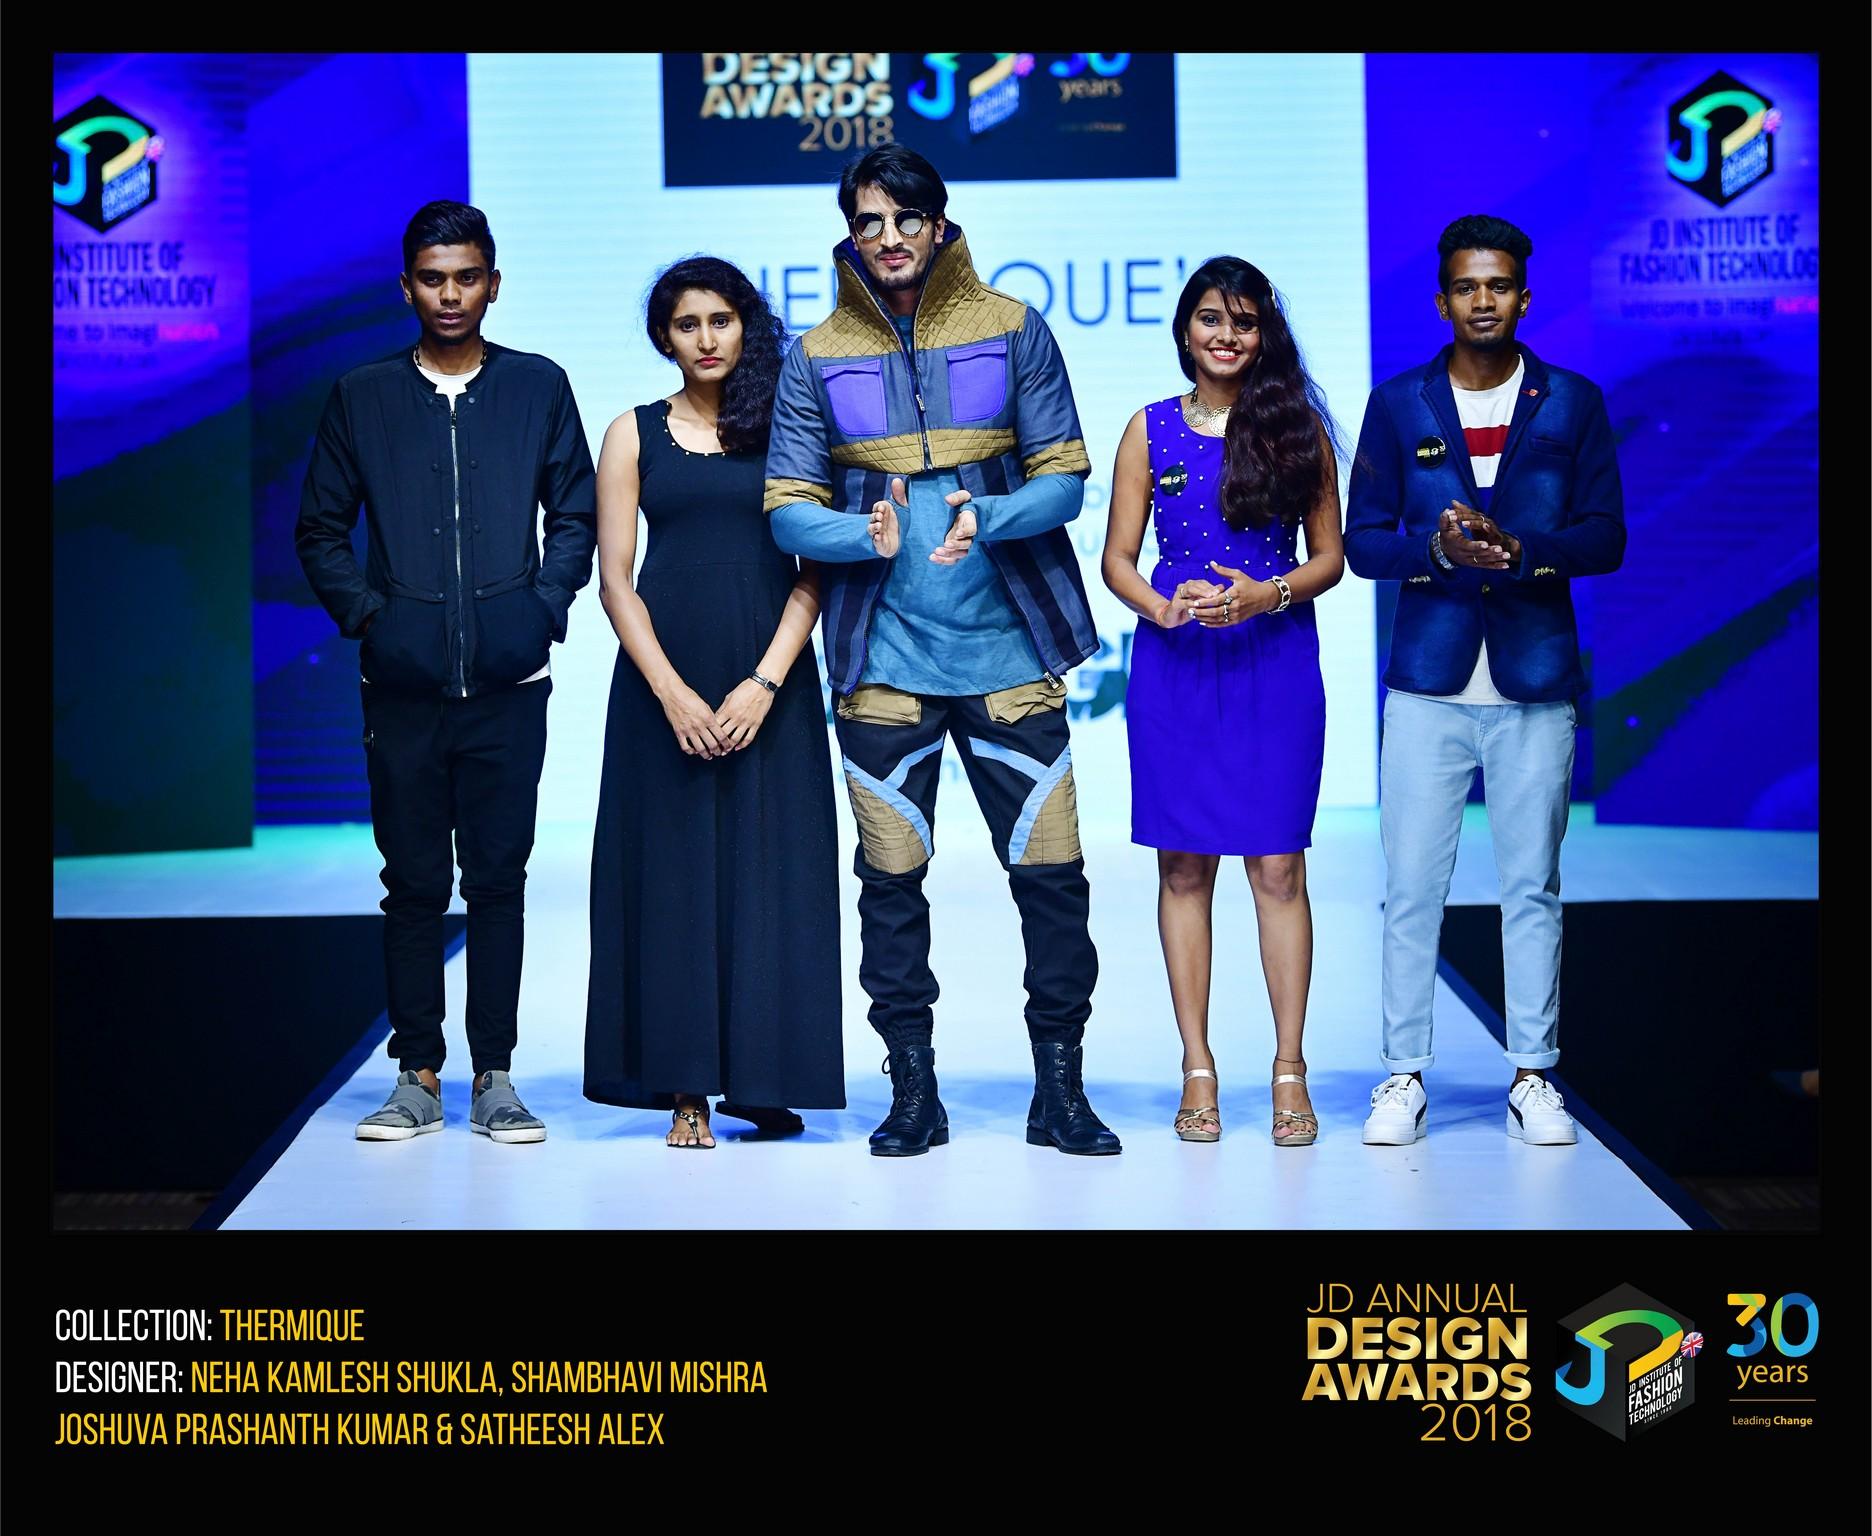 Thermique – Change – JD Annual Design Awards 2018 | Designer: Shambhavi, Neha and satish | Photography : Jerin Nath (@jerin_nath) thermique - THERMIQUE 10 - Thermique – Change – JD Annual Design Awards 2018